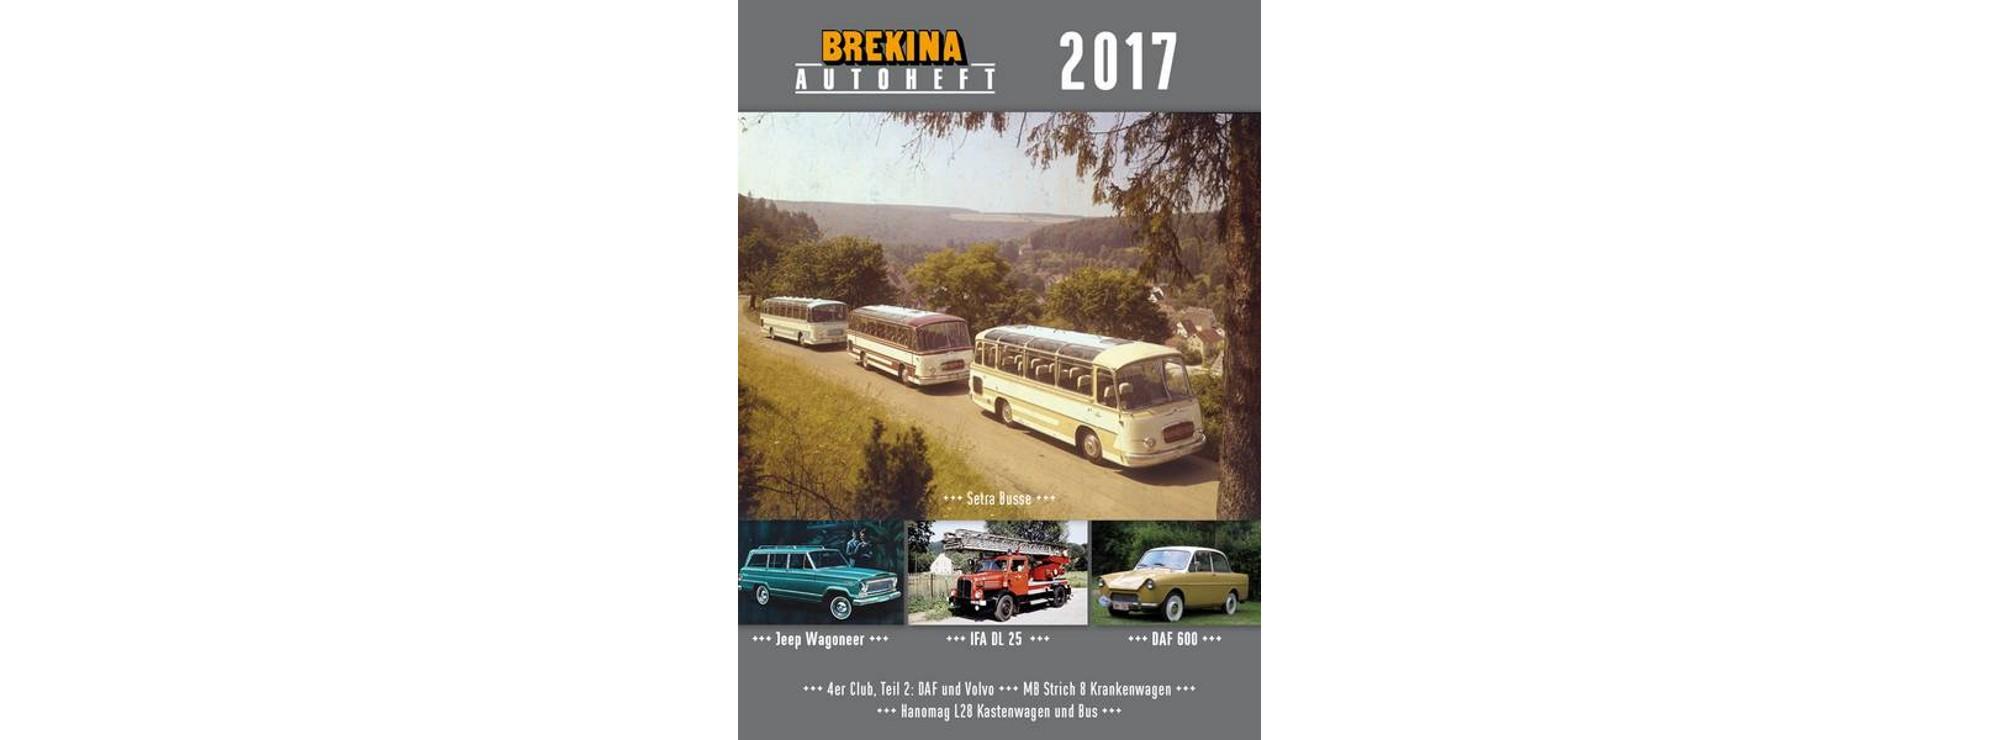 Brekina Autoheft 2017